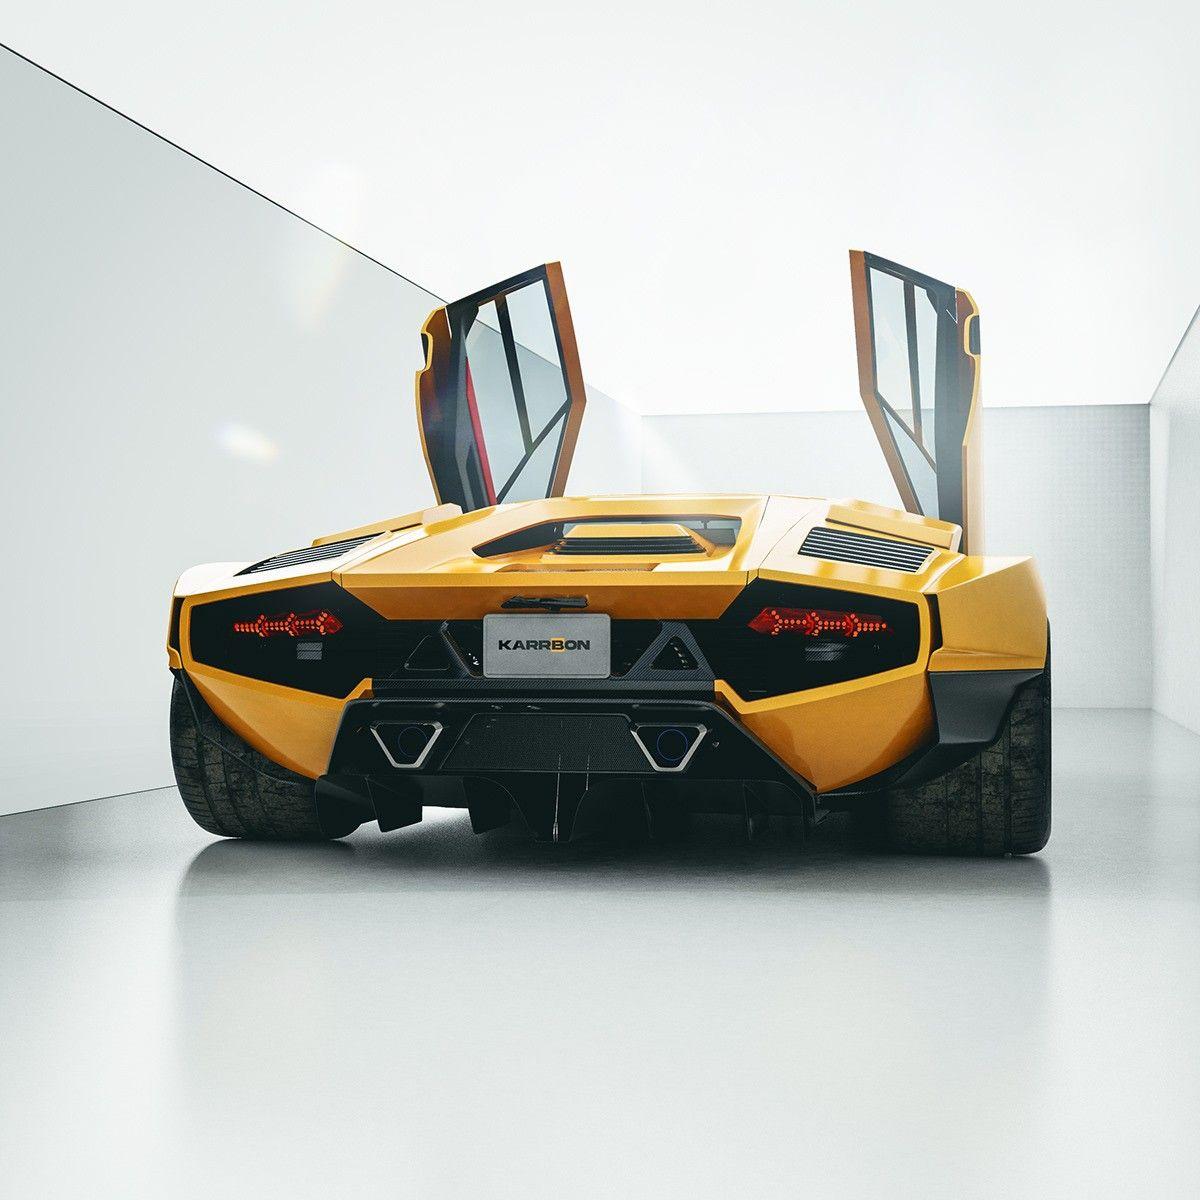 500 body kit study ideas in 2020 body kit concept cars super cars 500 body kit study ideas in 2020